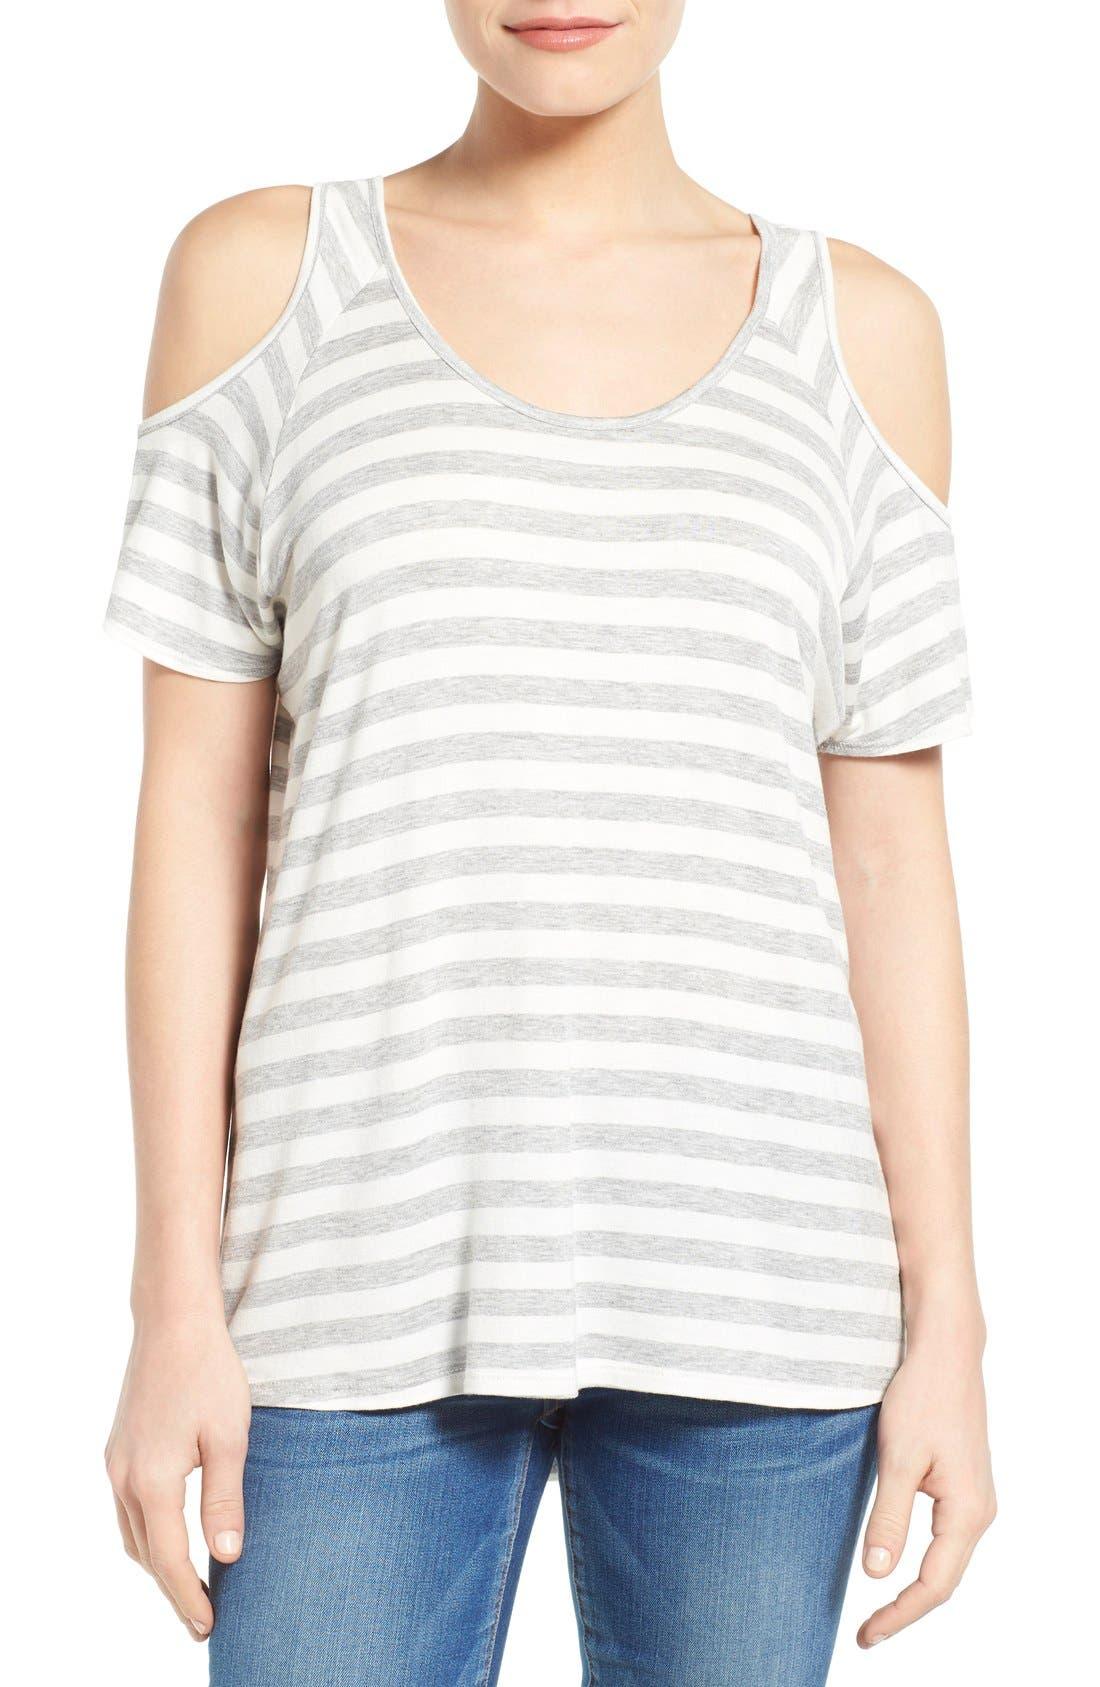 Alternate Image 1 Selected - KUT from the Kloth 'Caroline' Cold Shoulder Stripe Top